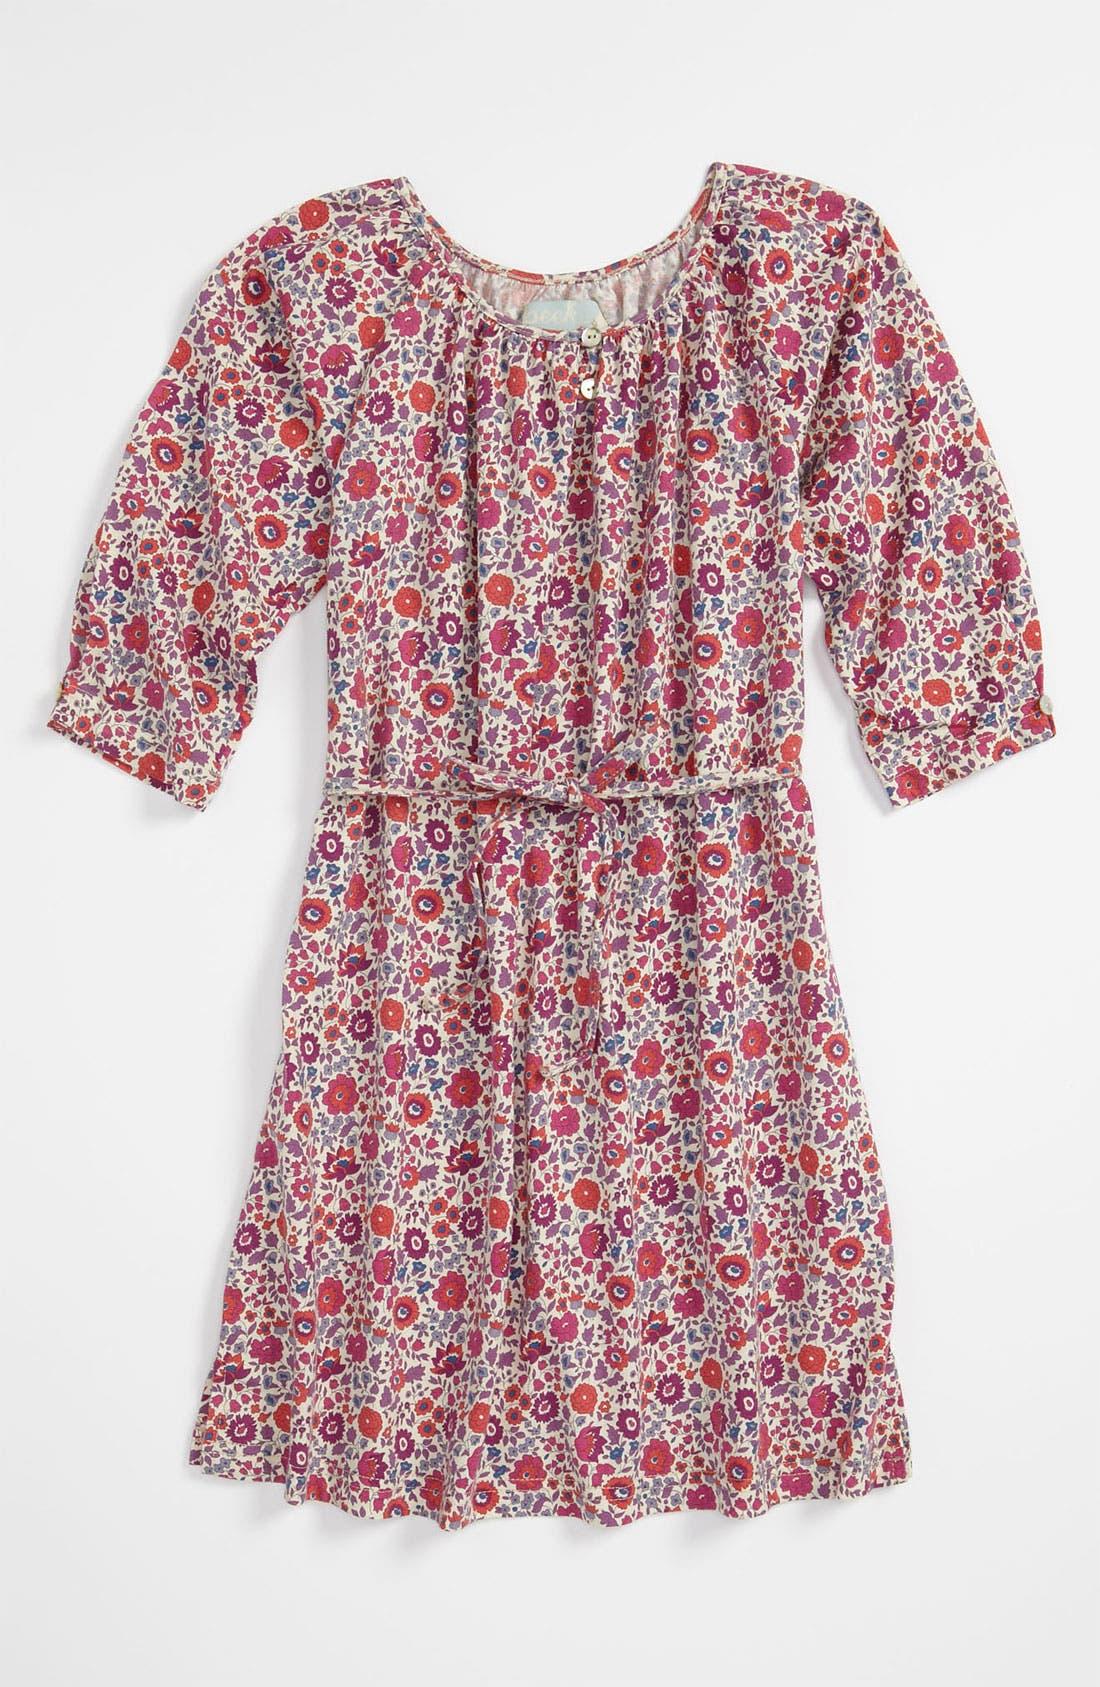 Main Image - Peek 'Suzy' Shirtdress (Toddler, Little Girls & Big Girls)